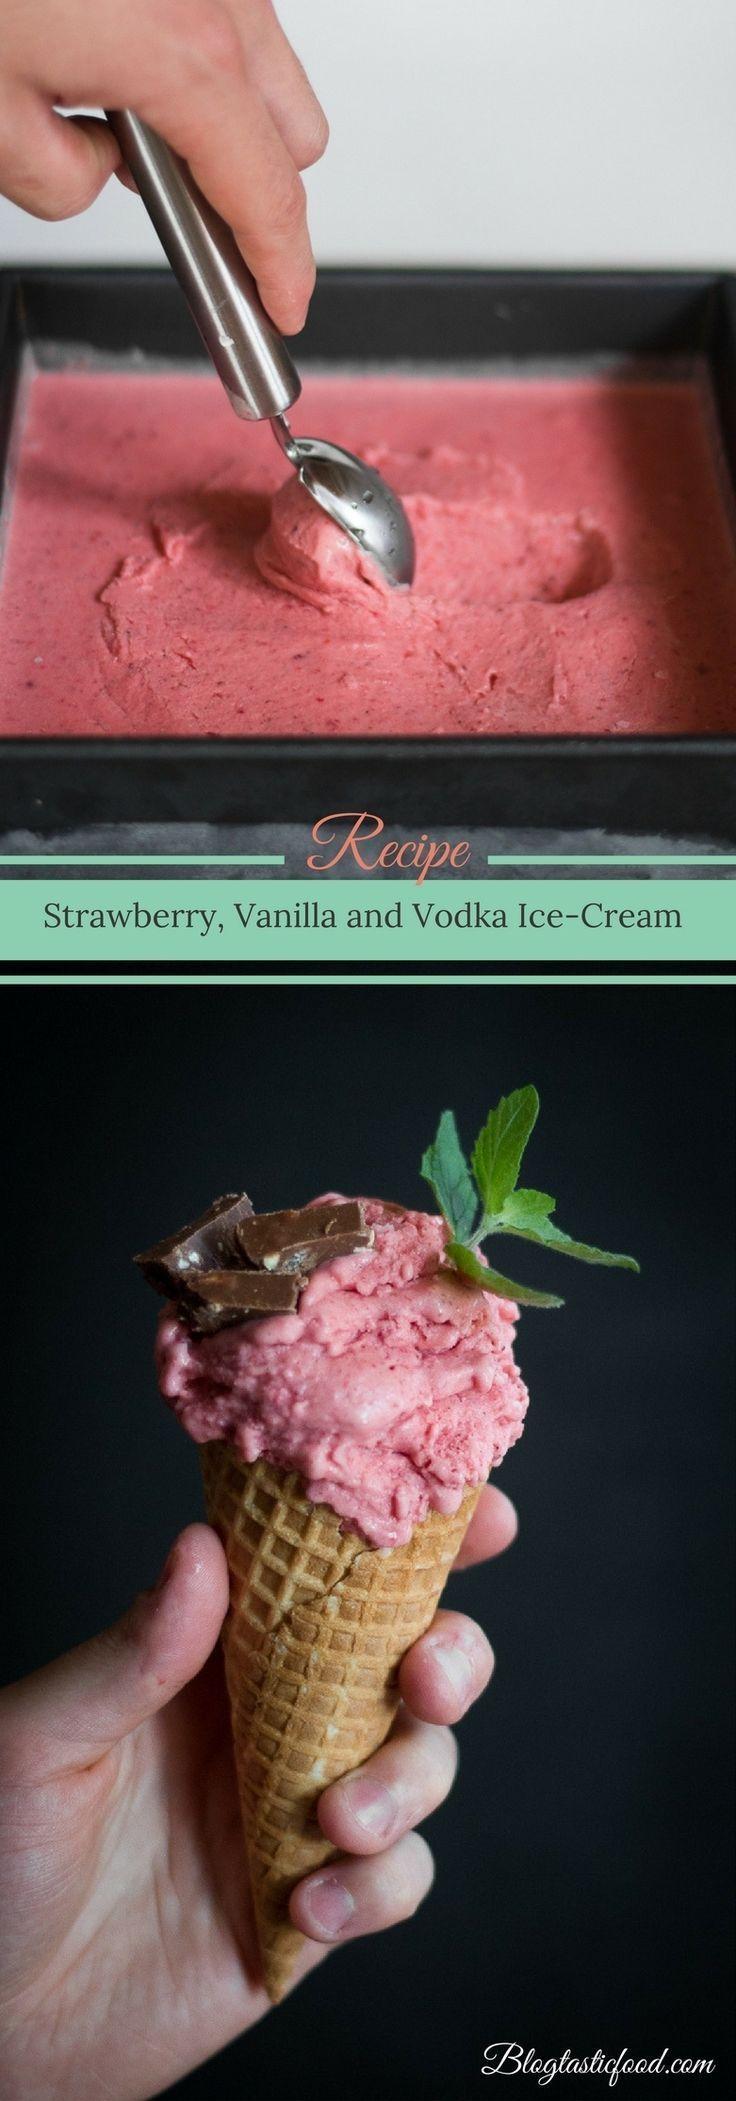 Strawberry Vanilla and Vodka Ice-Cream #vodkastrawberries Strawberry Vanilla and Vodka Ice-Cream #vodkastrawberries